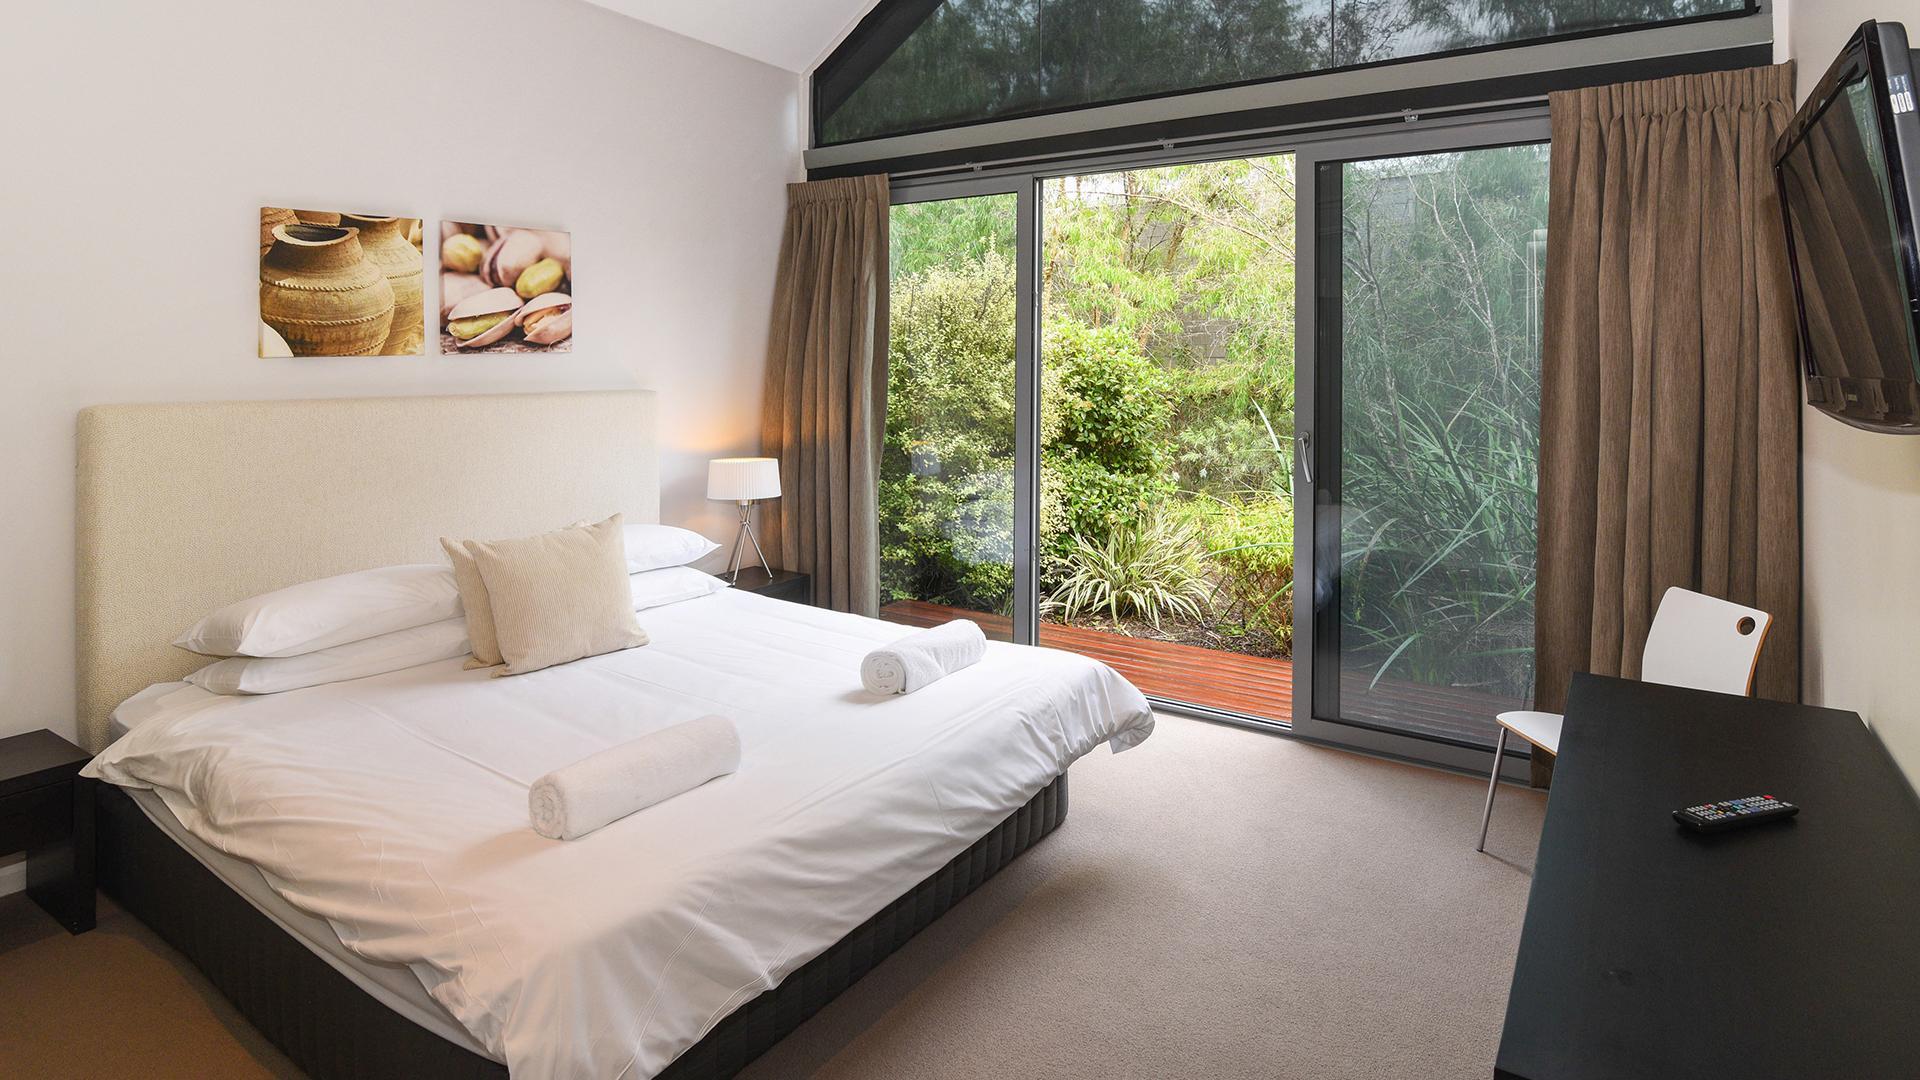 Two Bedroom Grove House image 1 at The Aqua Resort Busselton by City of Busselton, Western Australia, Australia